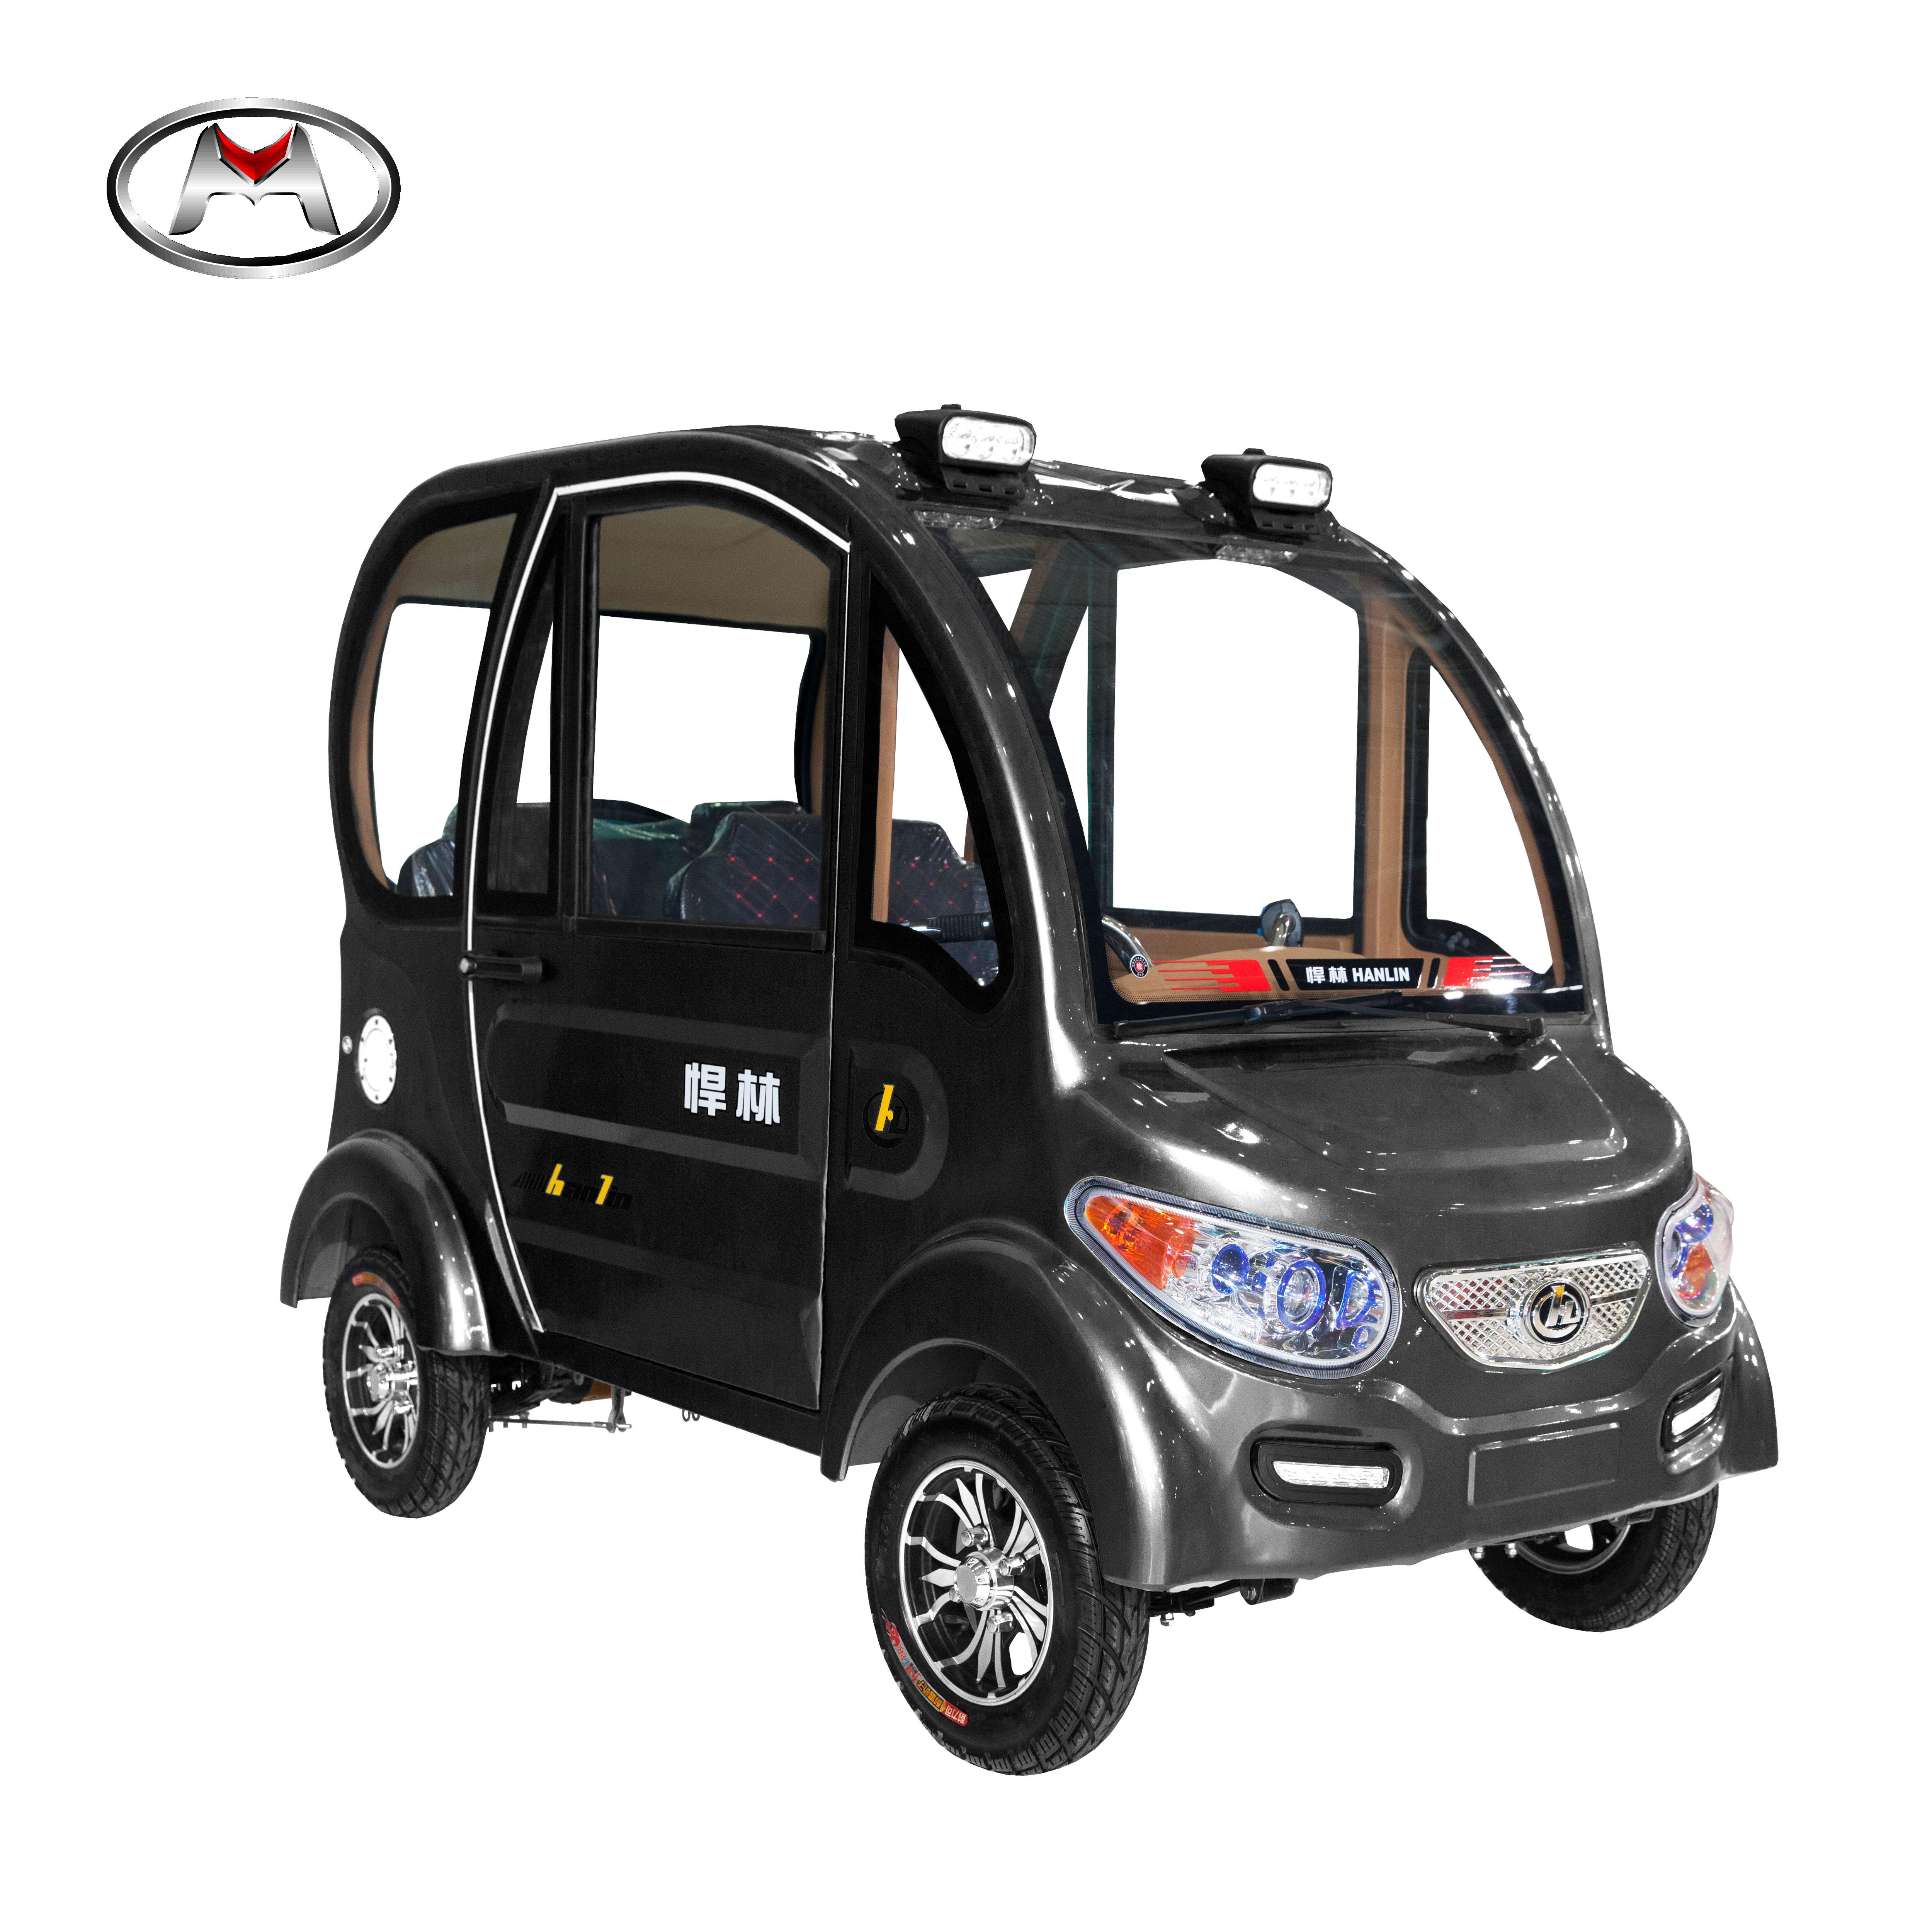 Mini Car Vacuum >> Lithium Battery Power Passenger Mini Car Vacuum Tire Battery Auto Rickshaw Electric Rickshaw Electric Powered Min Car Buy Lithium Battery Power